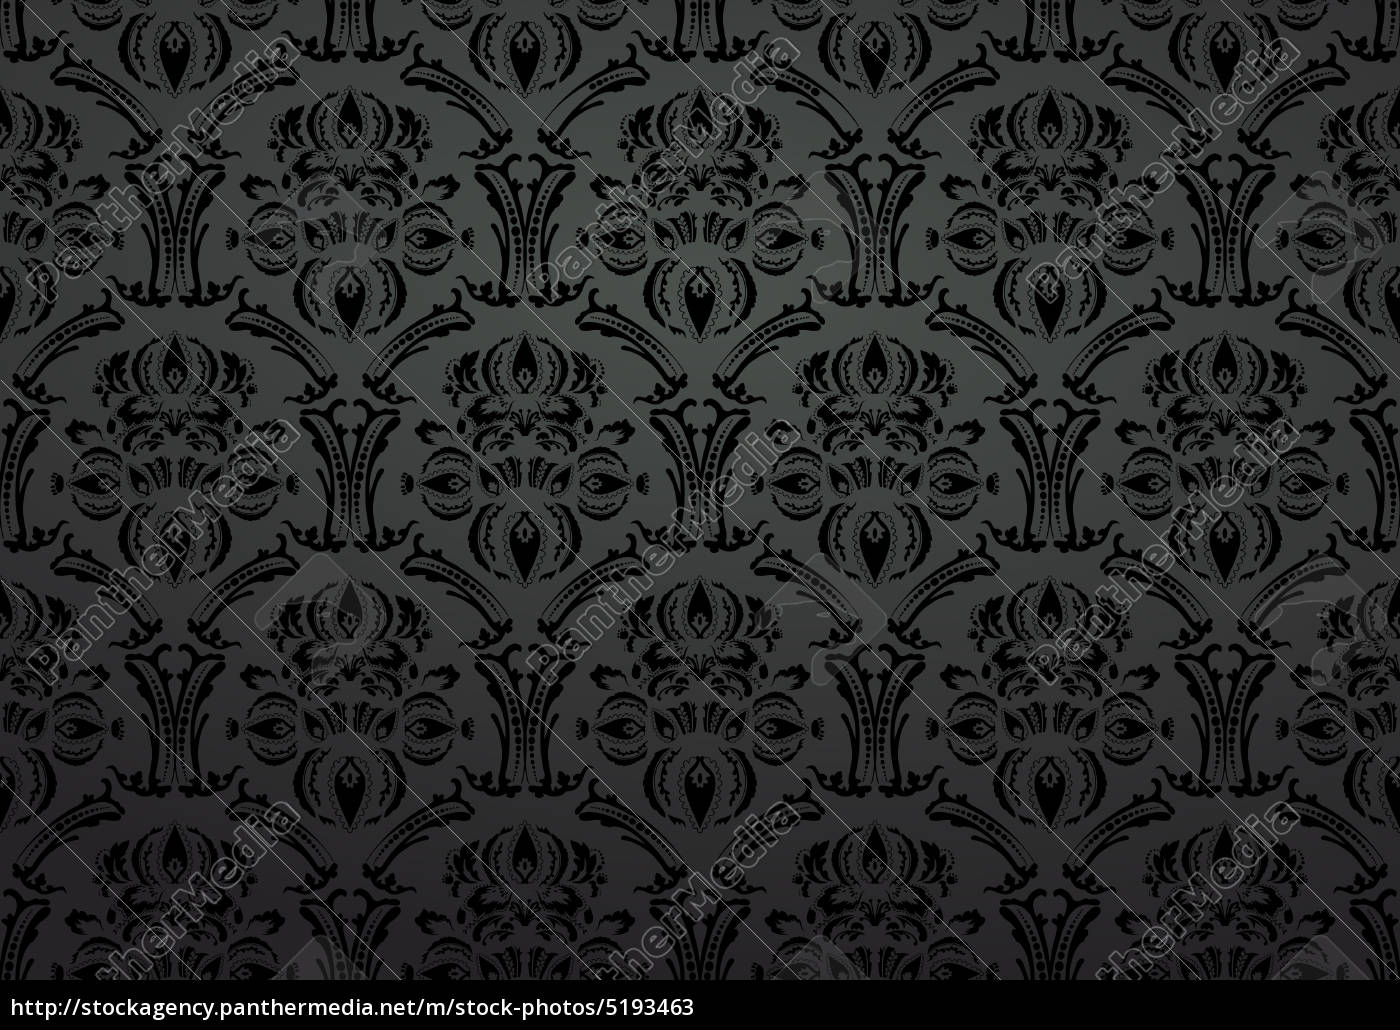 Fabric Wallpaper Ornament Black Stock Photo 5193463 Panthermedia Stock Agency